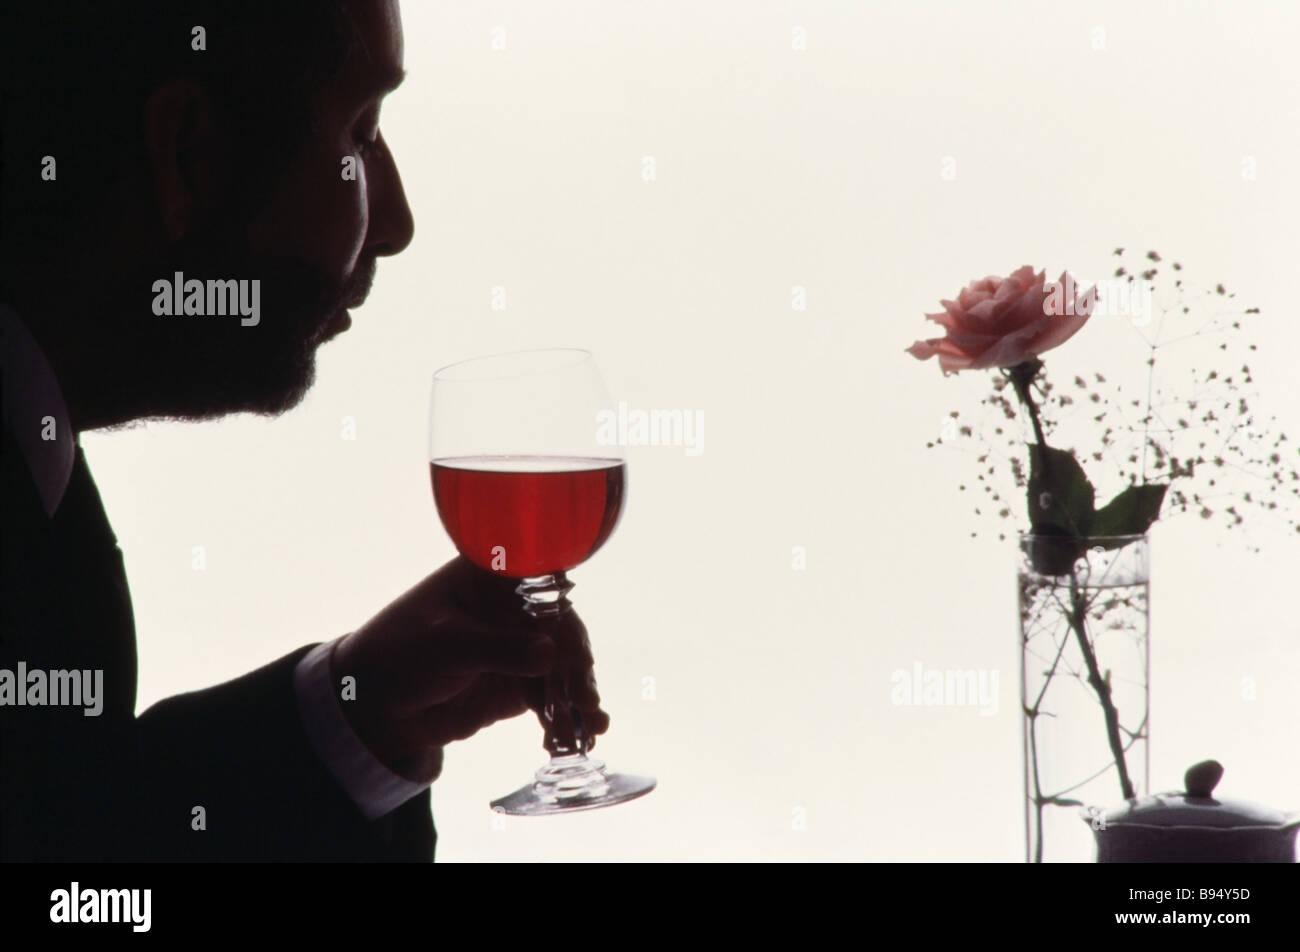 Food Display, gourmet resturant, Resurant critic tasting wine - Stock Image